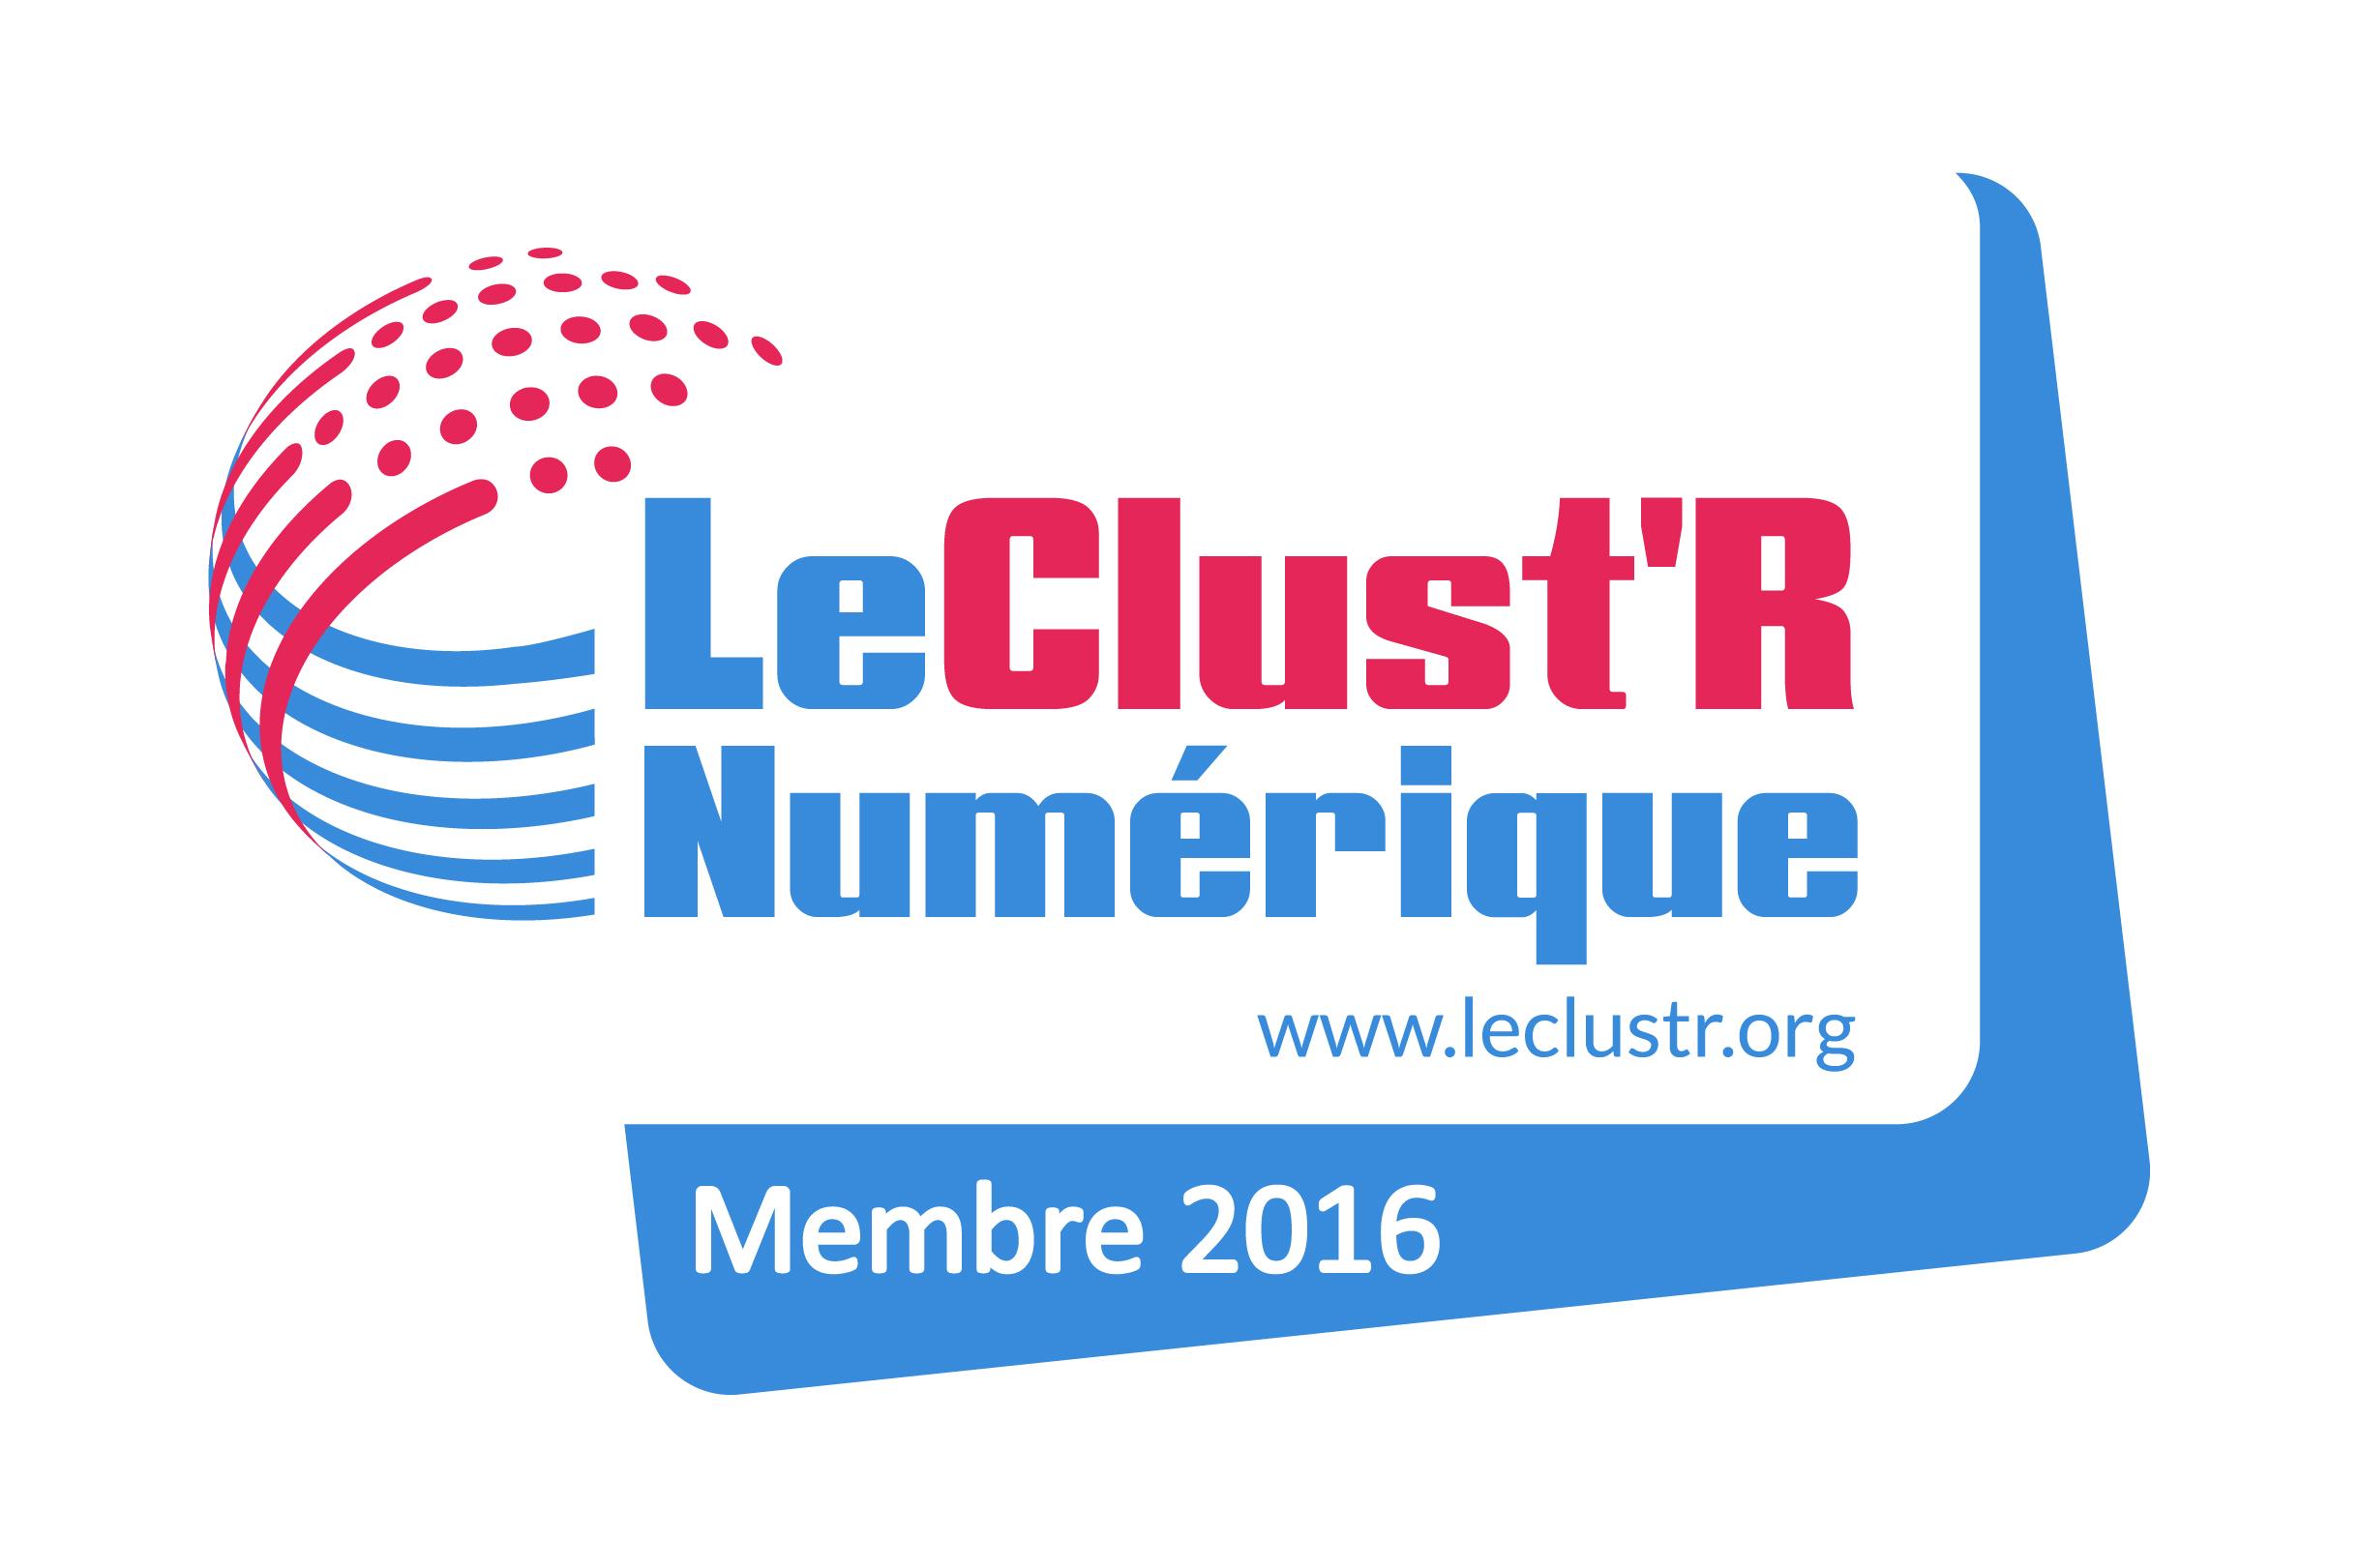 ClustR Numerique - Member 2016